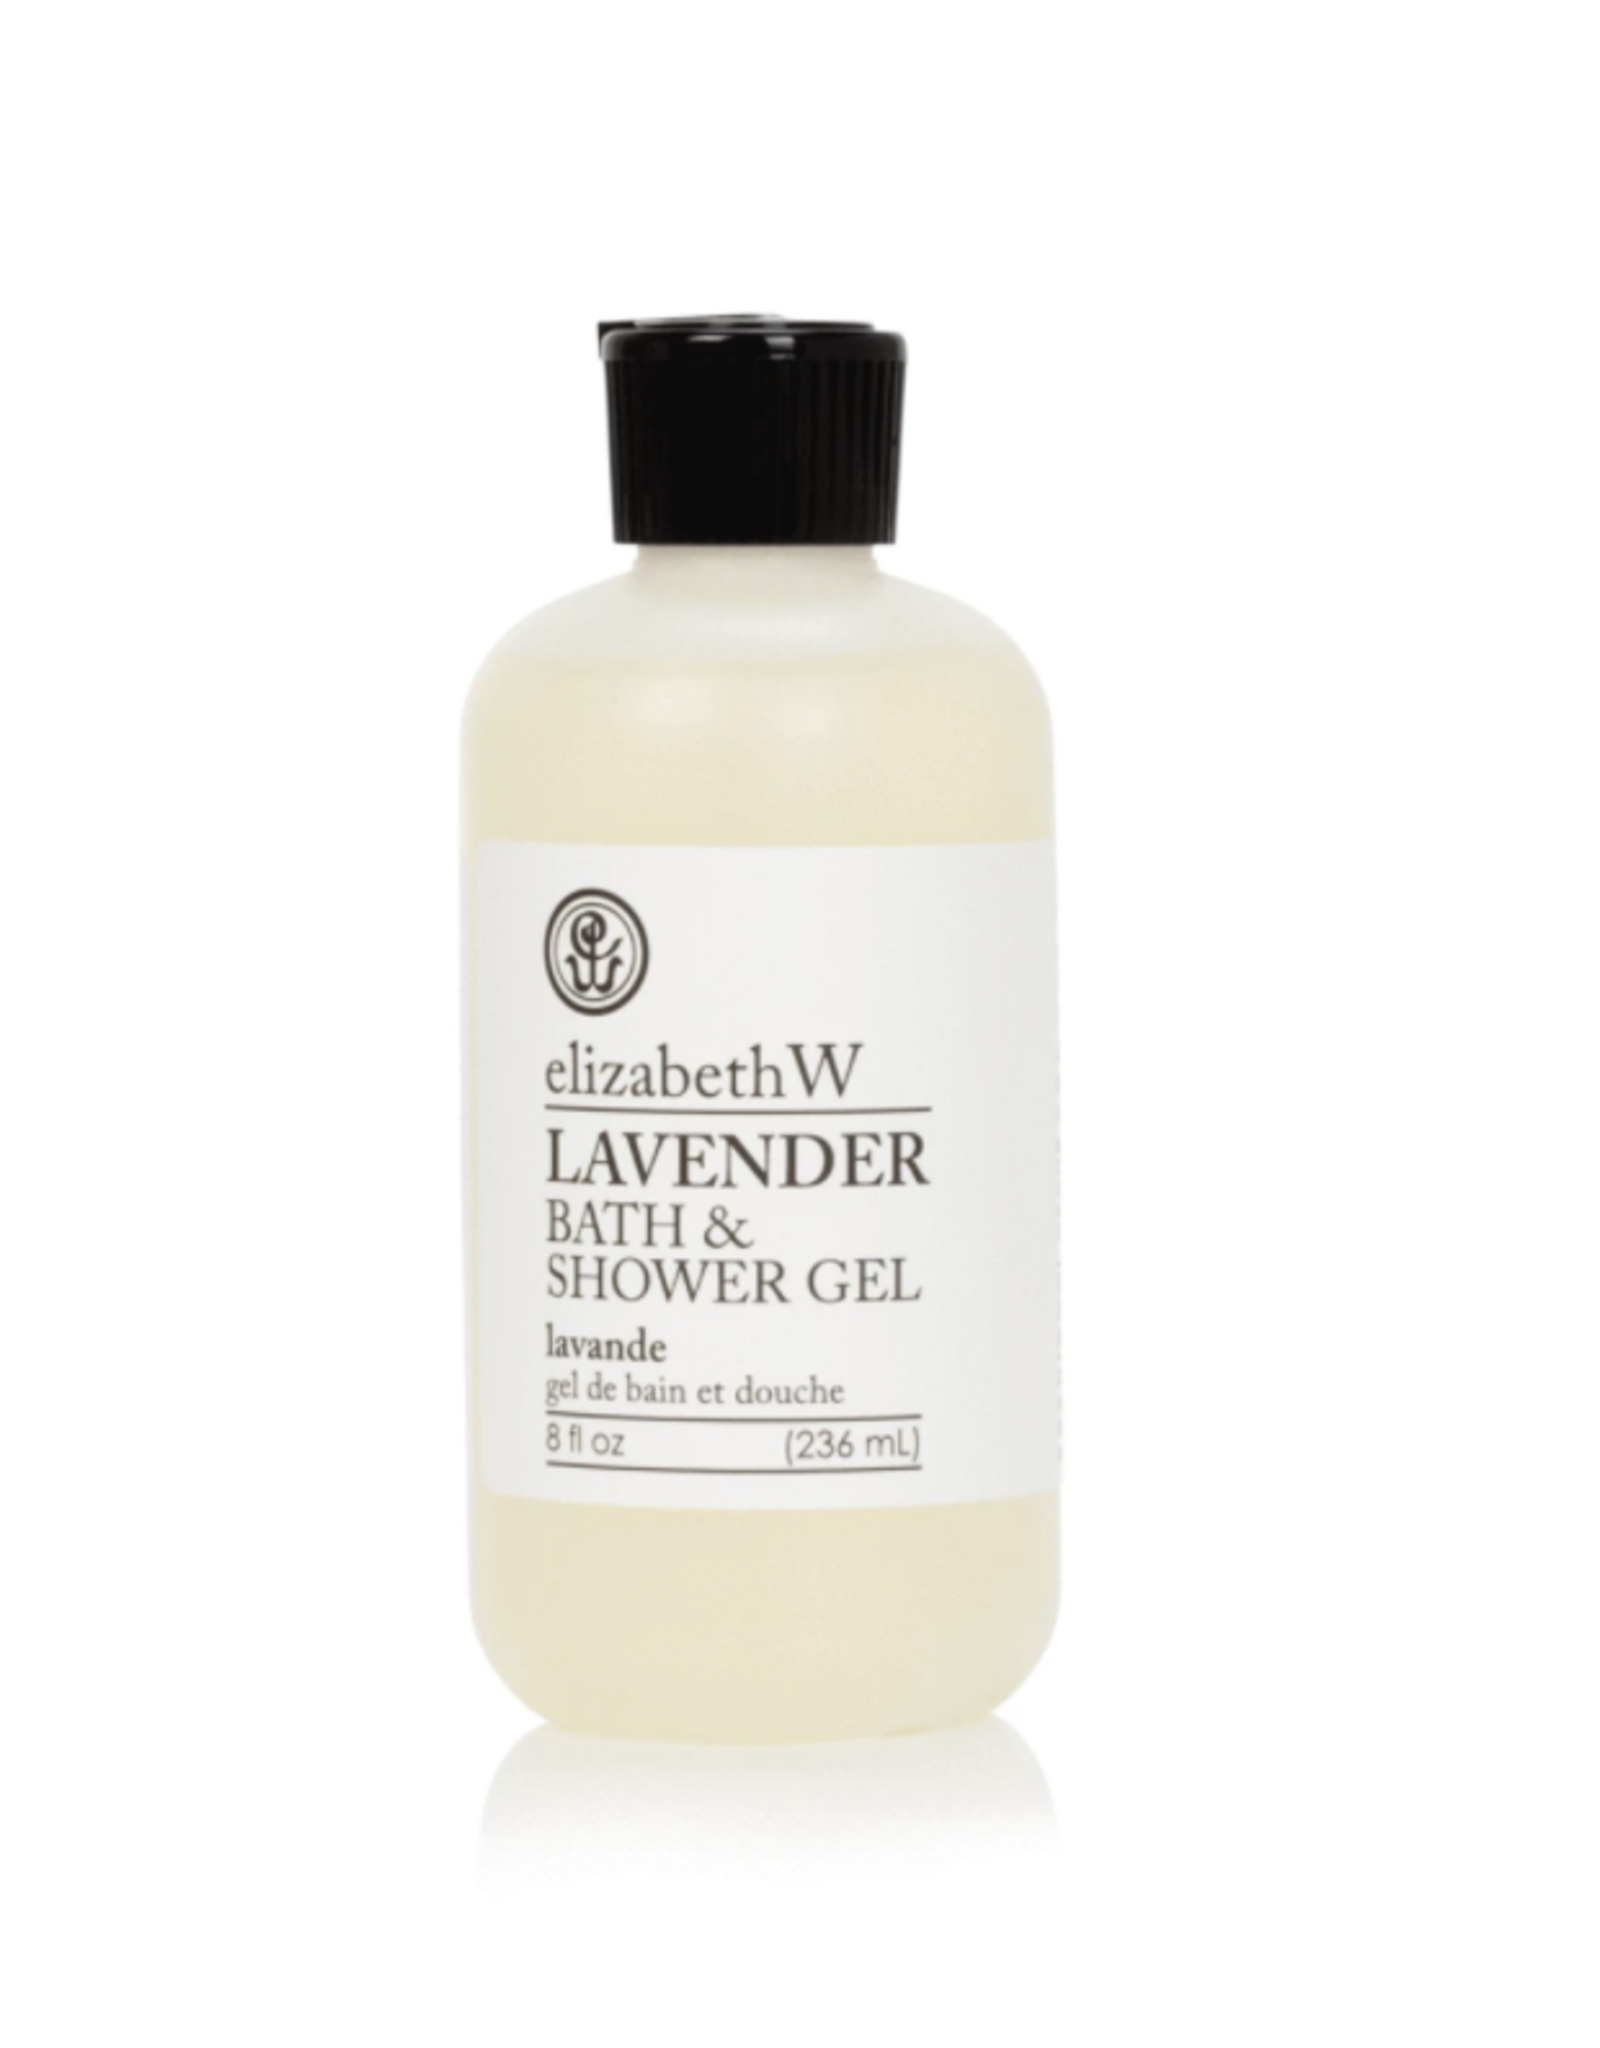 Elizabeth W Lavender Shower Gel 8oz